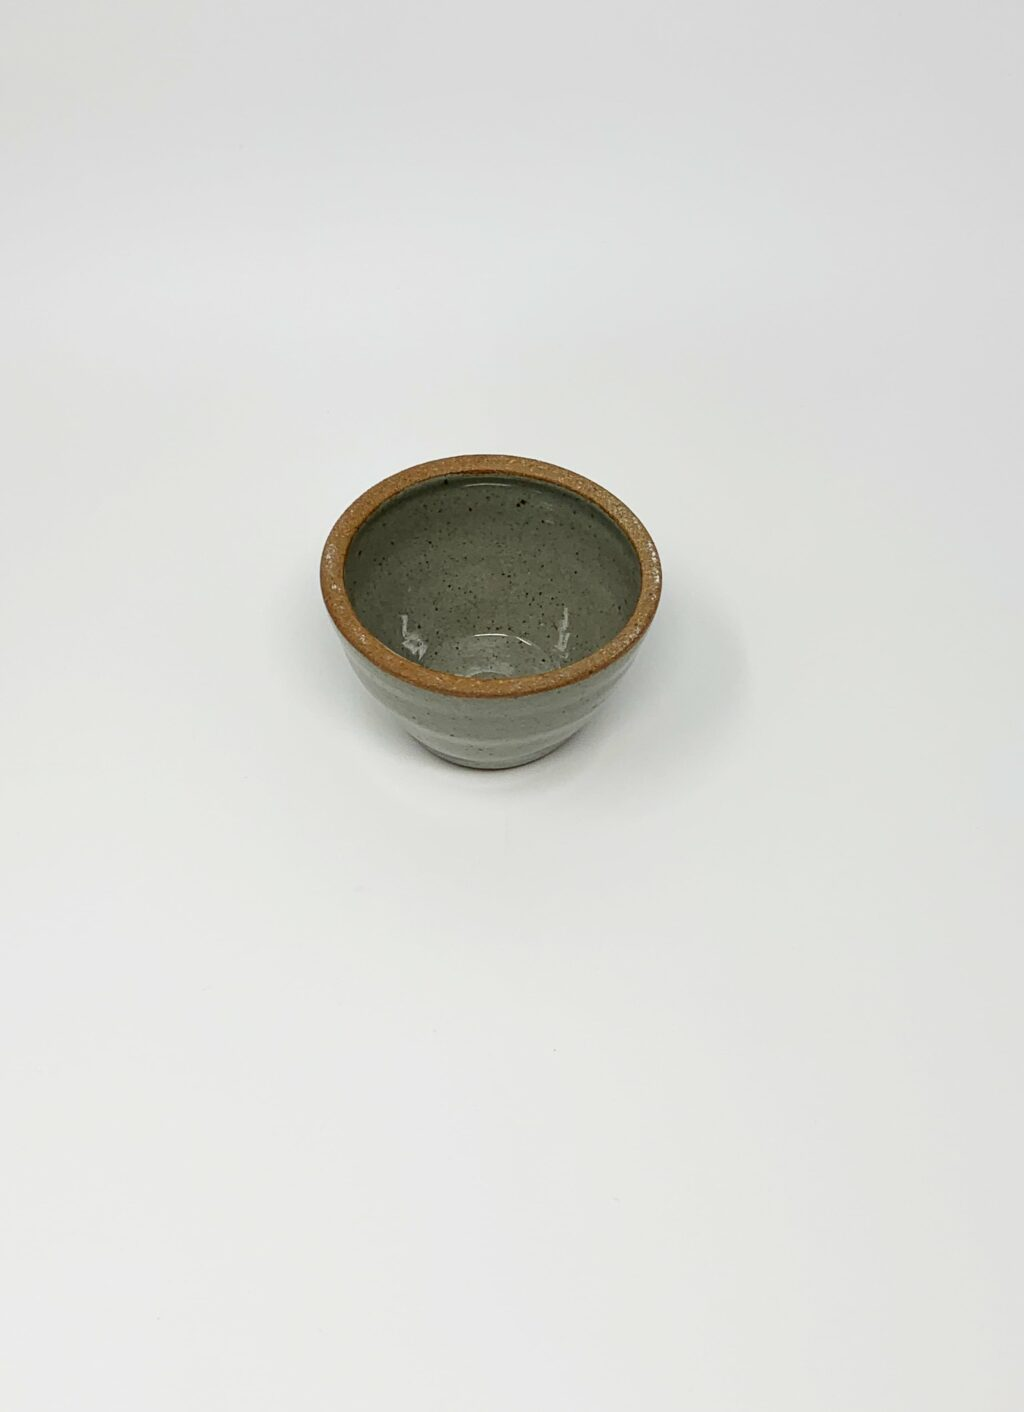 Incausa - Wood Fired Stoneware Smudge Bowl - Celadon - L